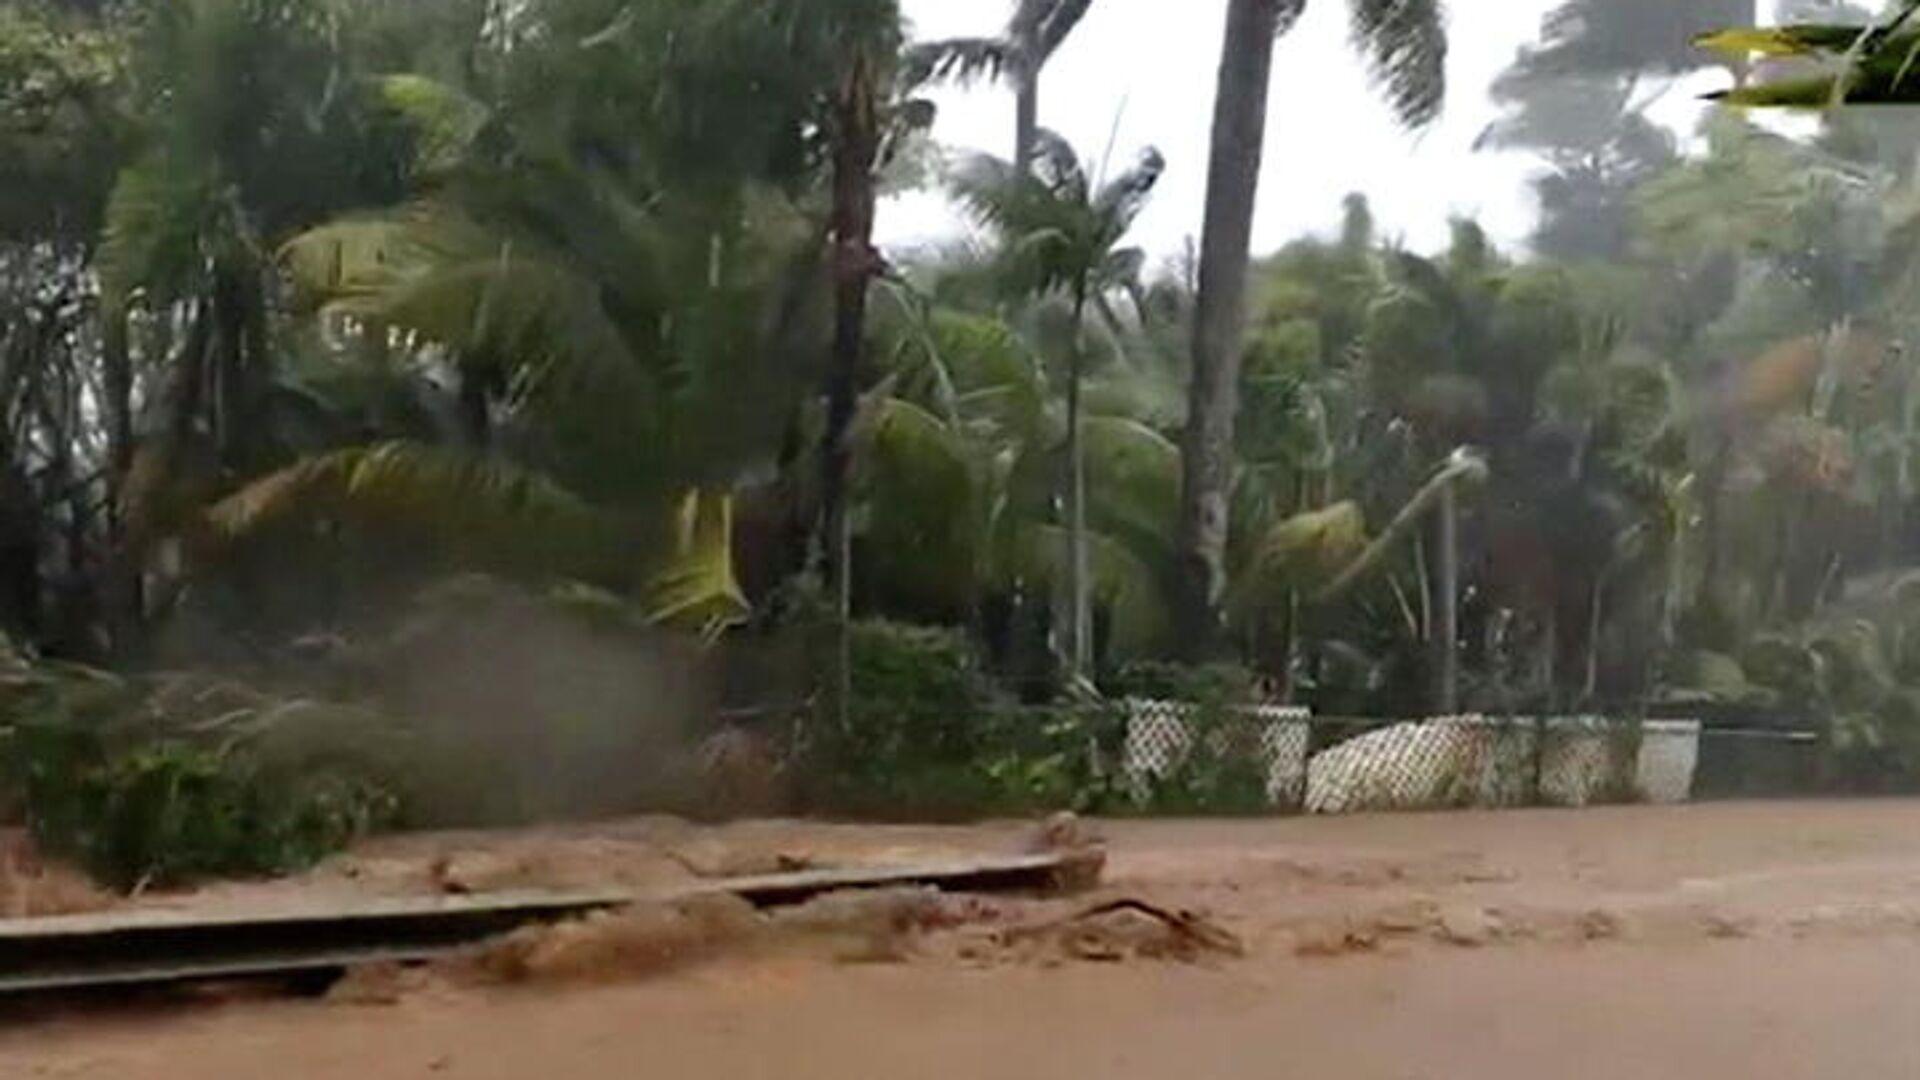 Затопленная дорога возле дамбы Каупакалуа, Гавайи - РИА Новости, 1920, 09.03.2021